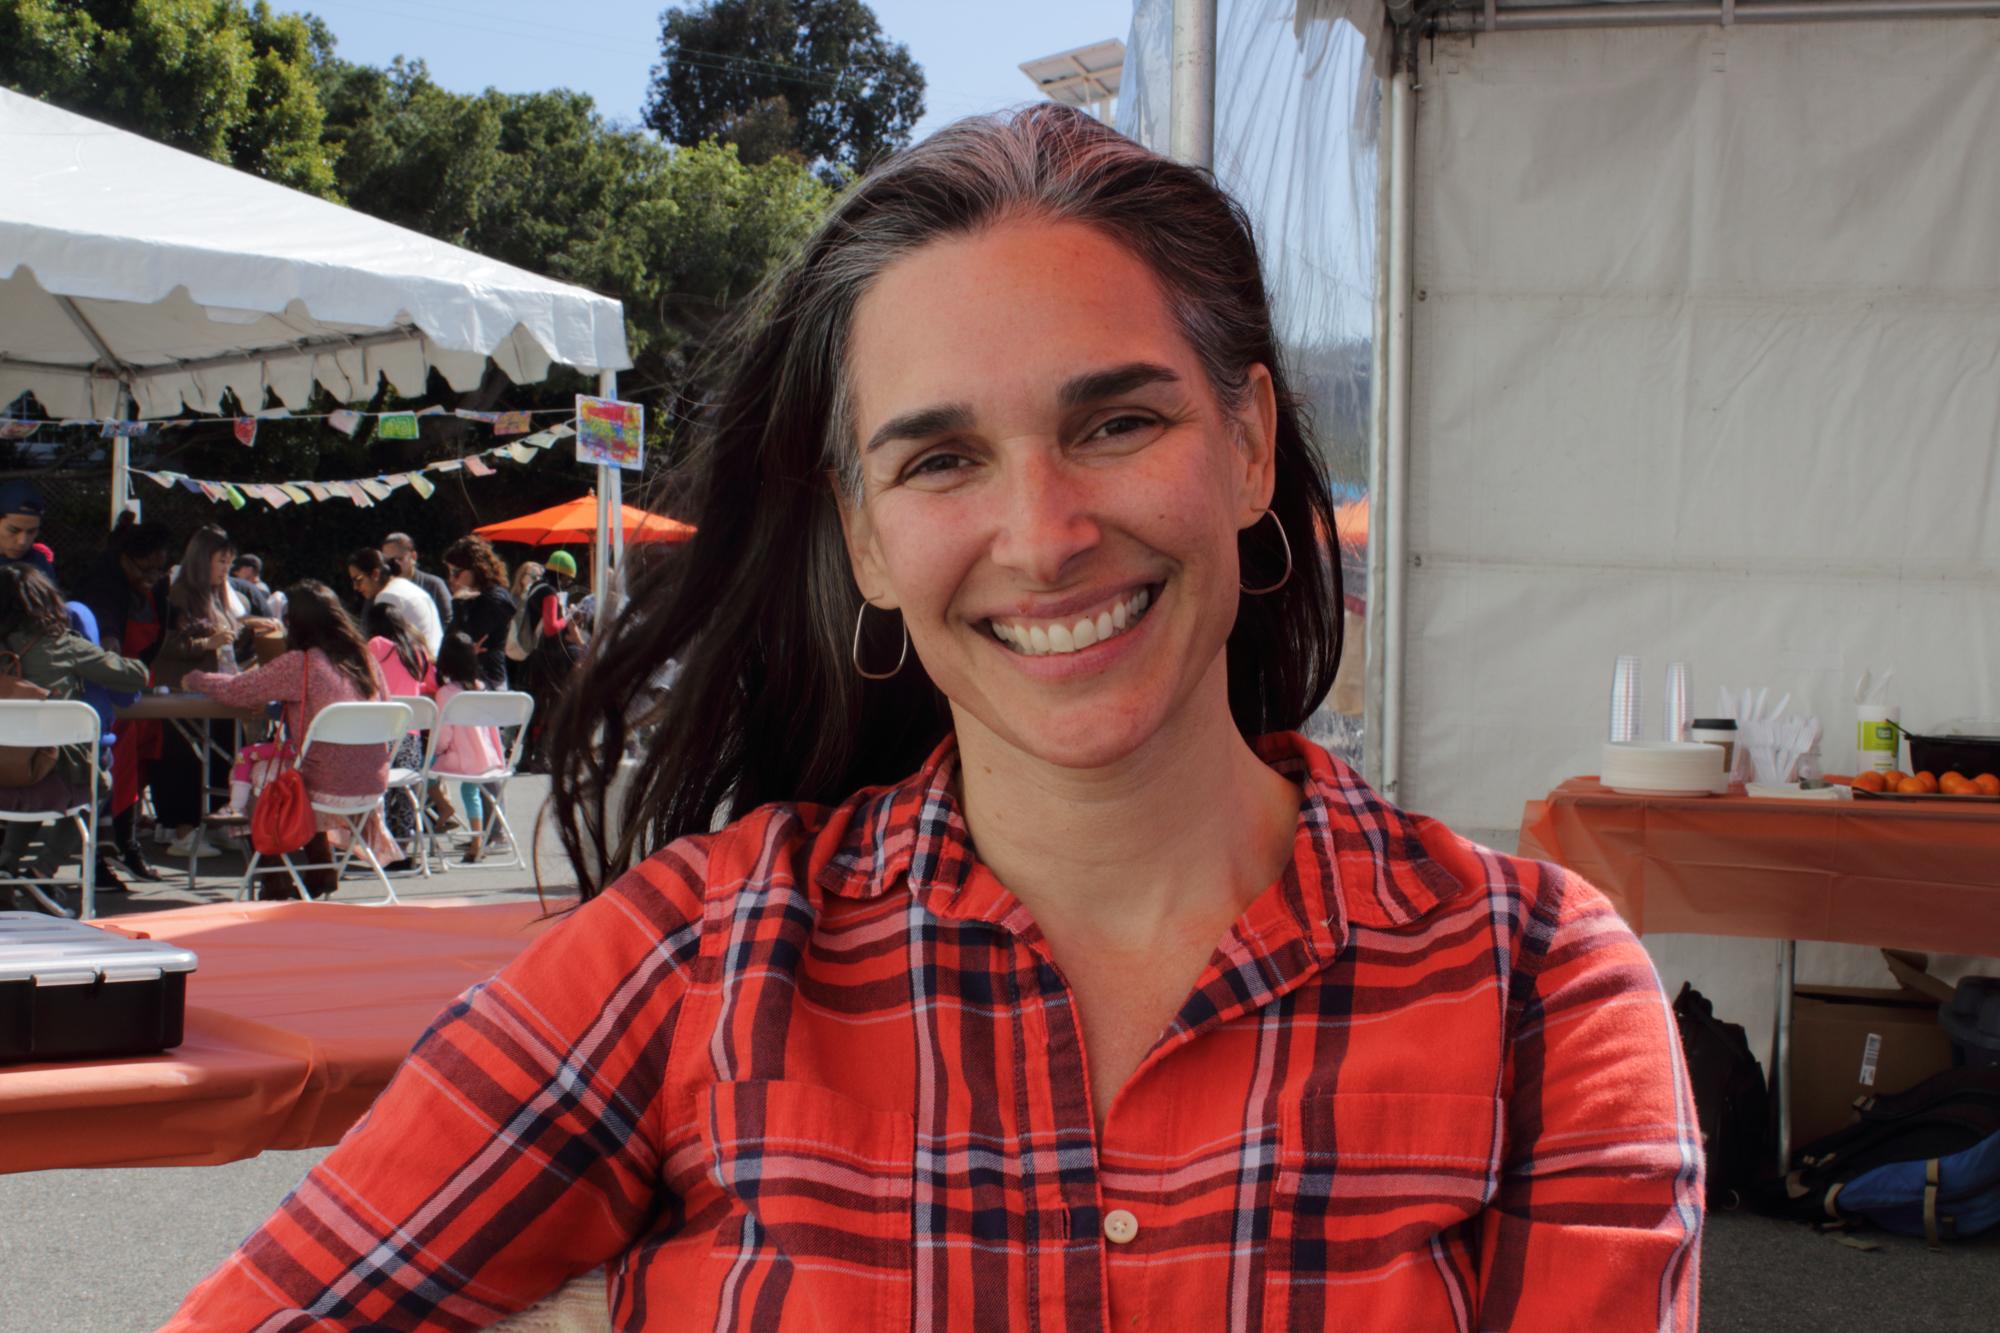 Allison Ostrovsky, City of Santa Monica Cultural Affairs Supervisor and event coordinator for the Santa Monica ArtWalk, near the information booth at the main entrance of the 12 Annual Santa Monica ArtWalk on March 24th, 2018 in Santa Monica, California. (Heather Creamer/ Corsair Photo).